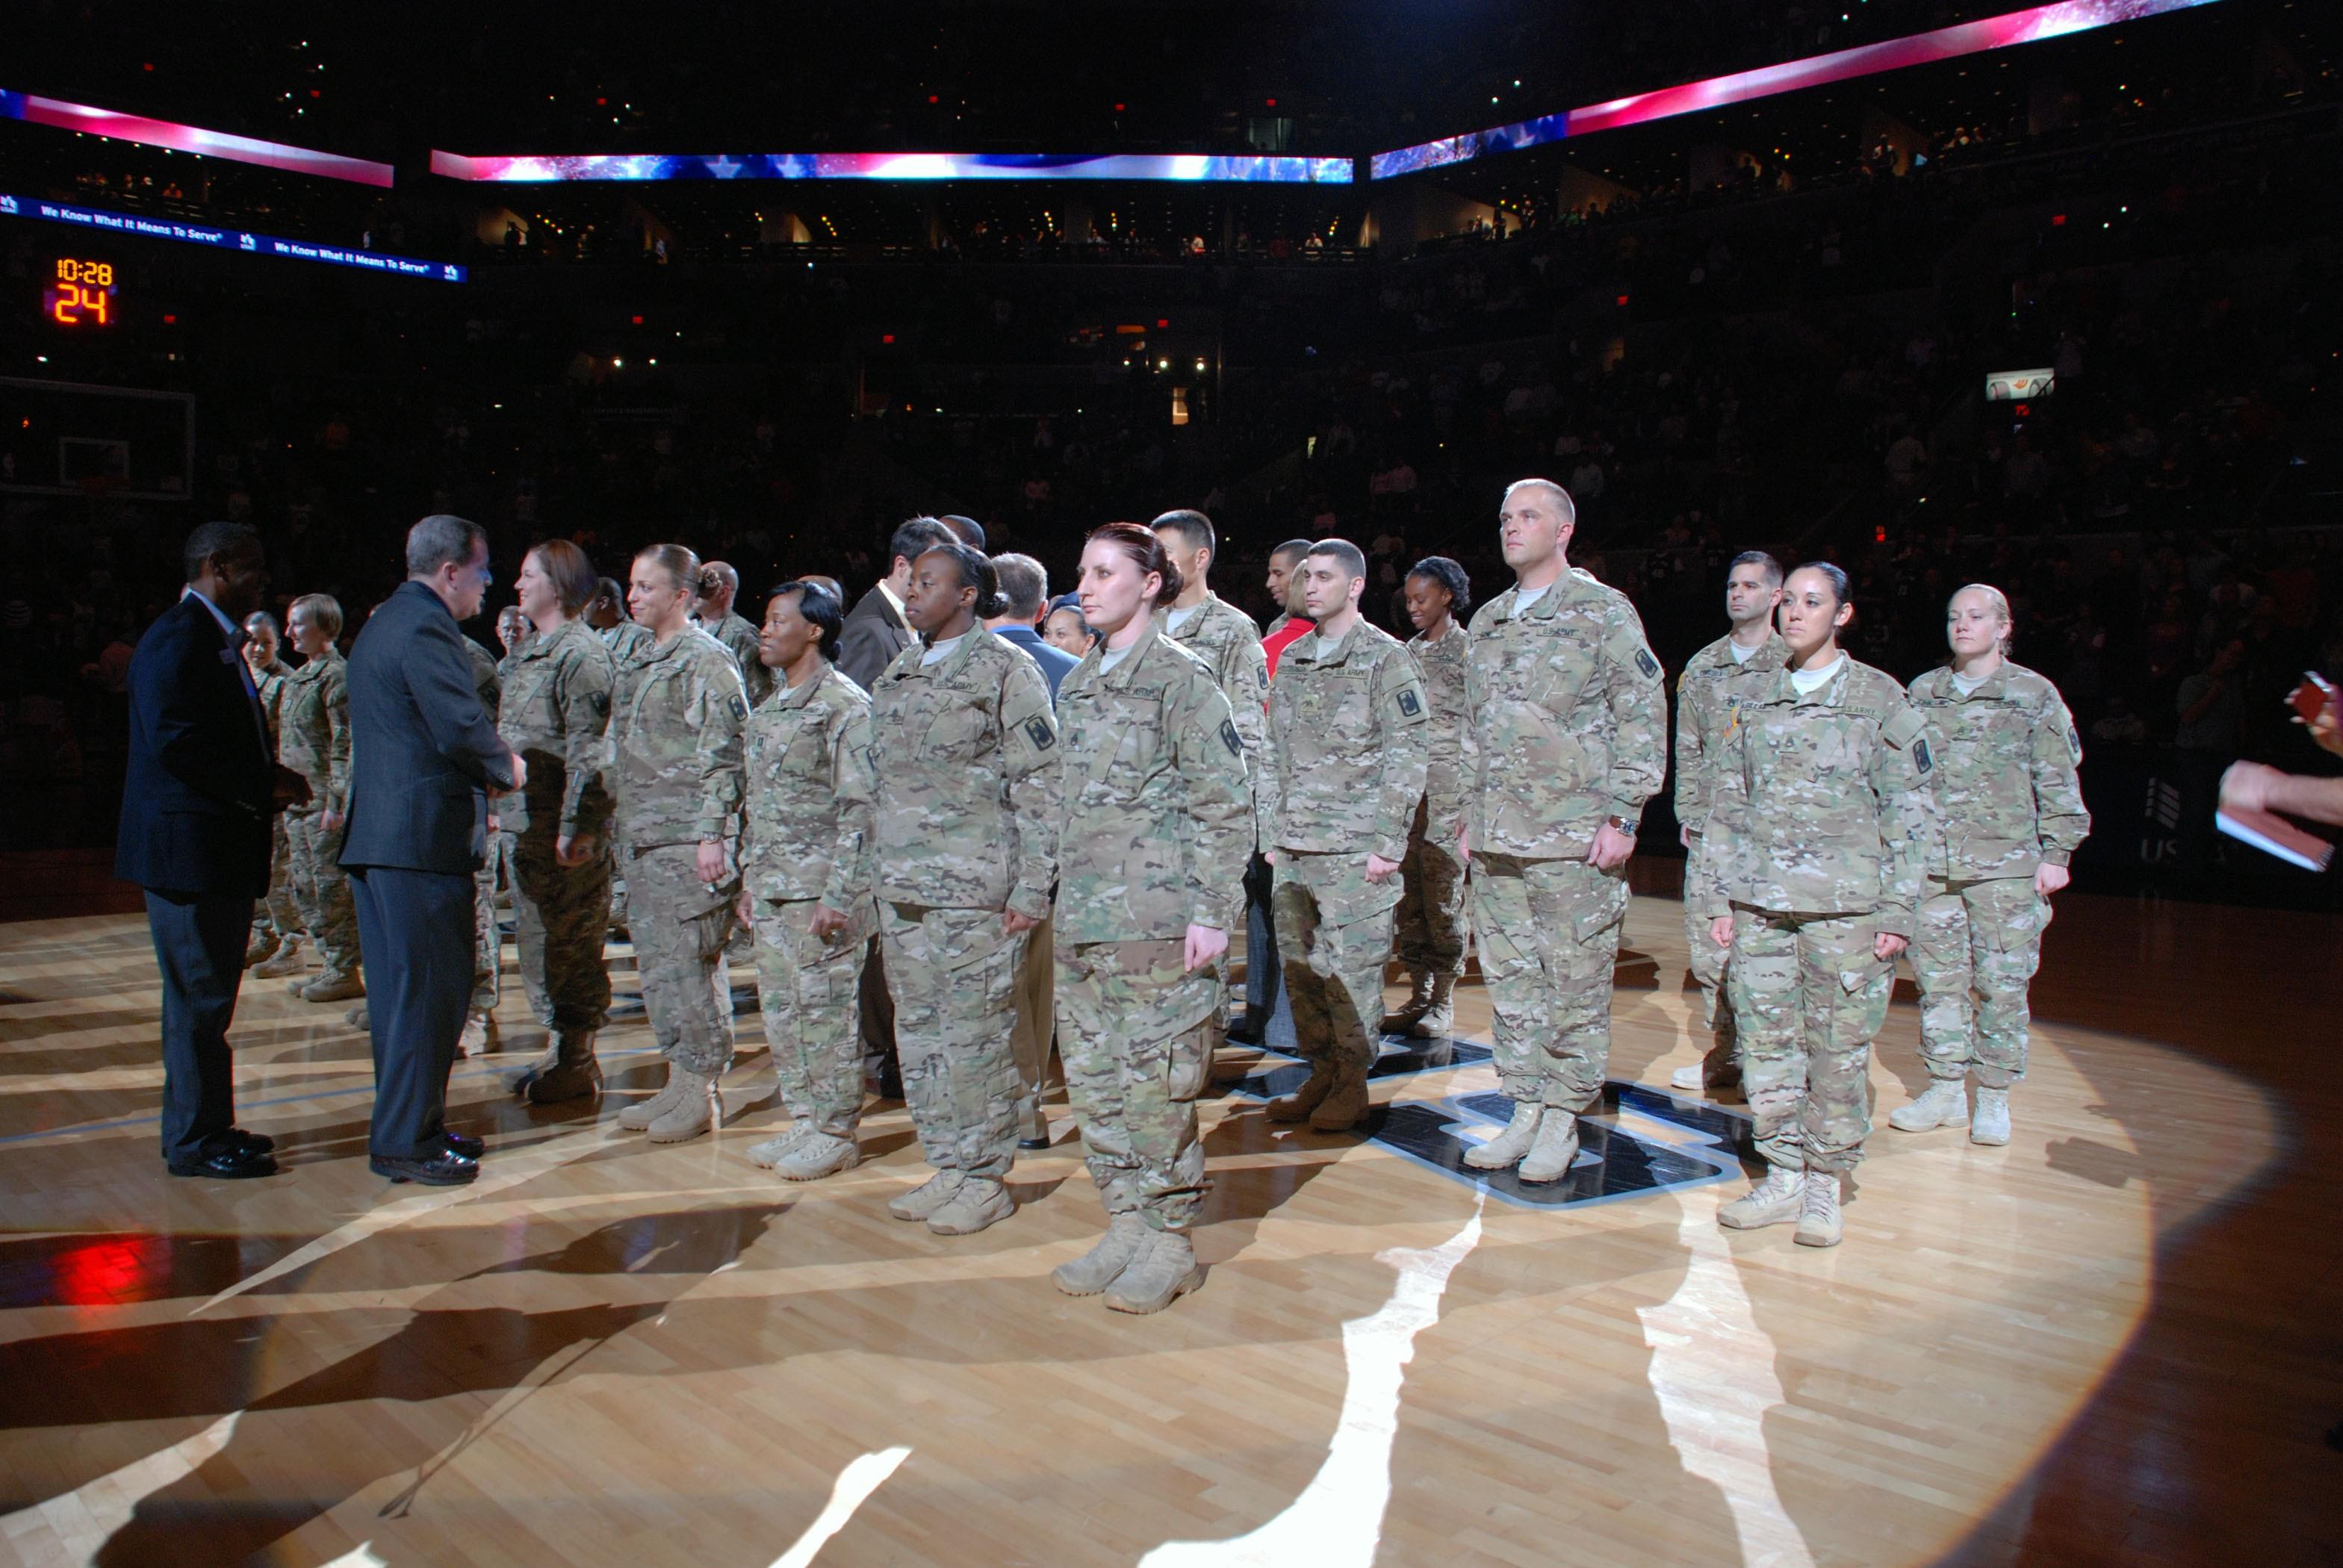 online store 93464 de4d3 Spurs share spotlight with two 470th MI Brigade battalions ...